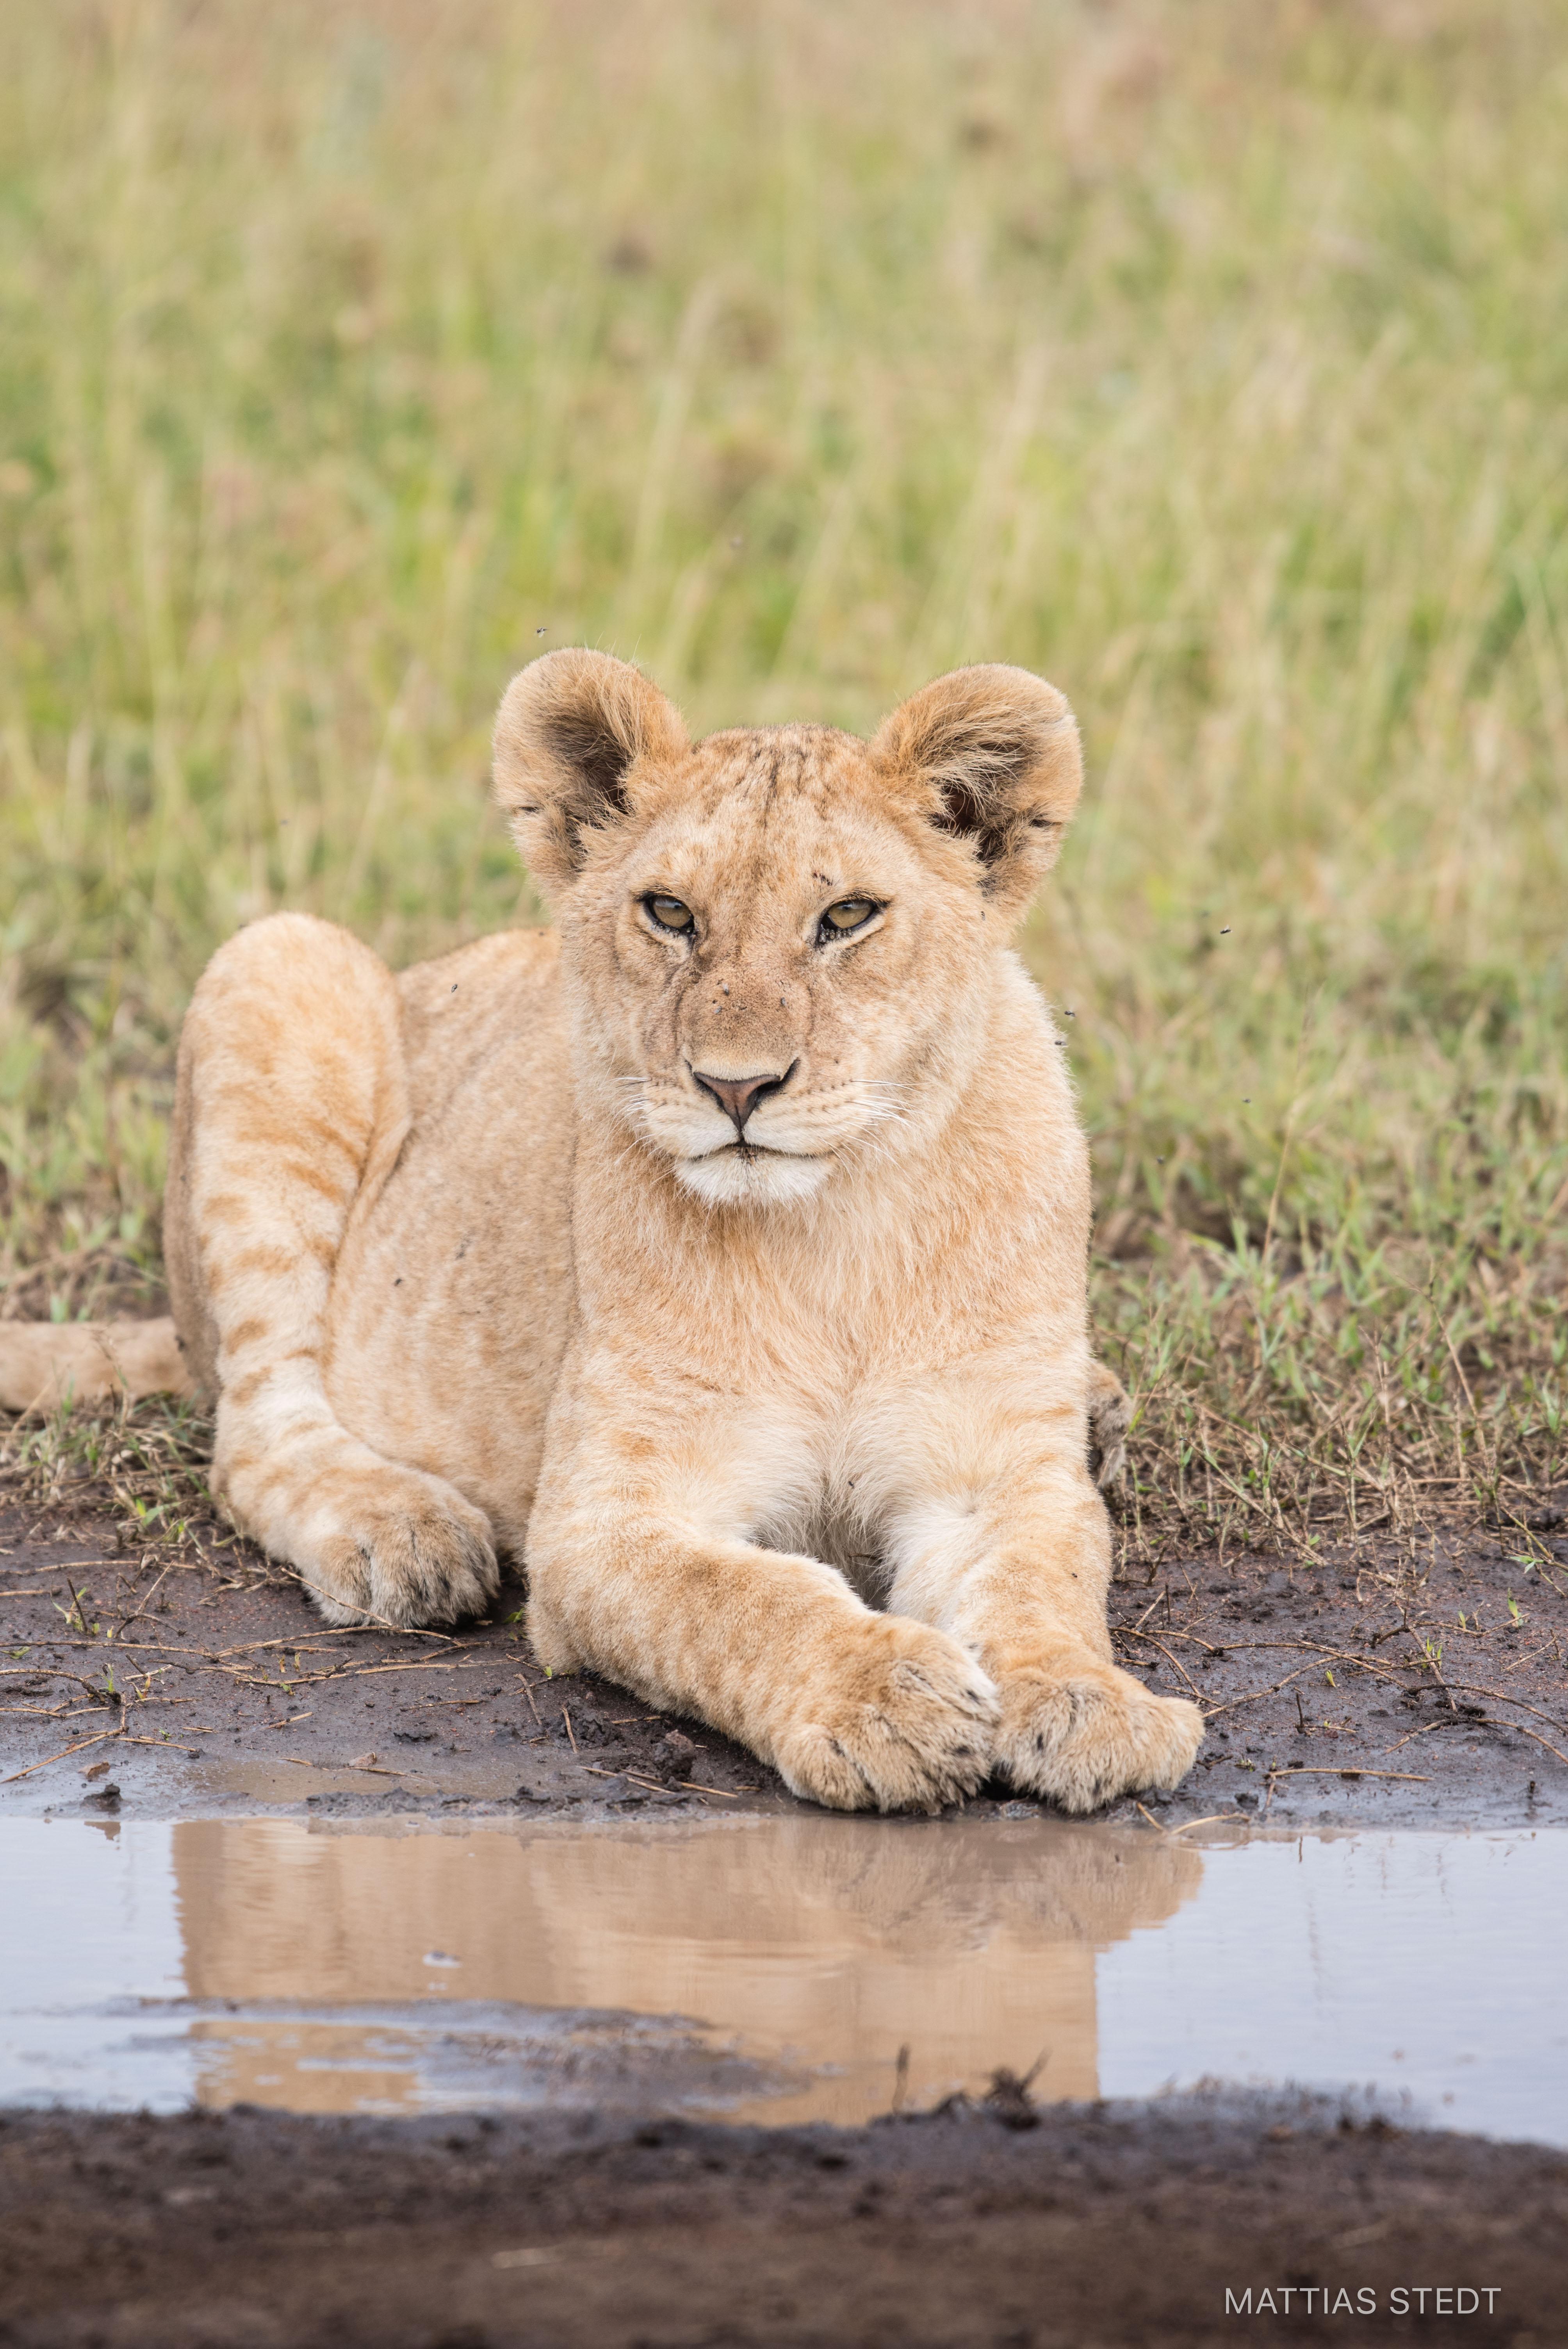 Lion cab, Serengeti Tanzania